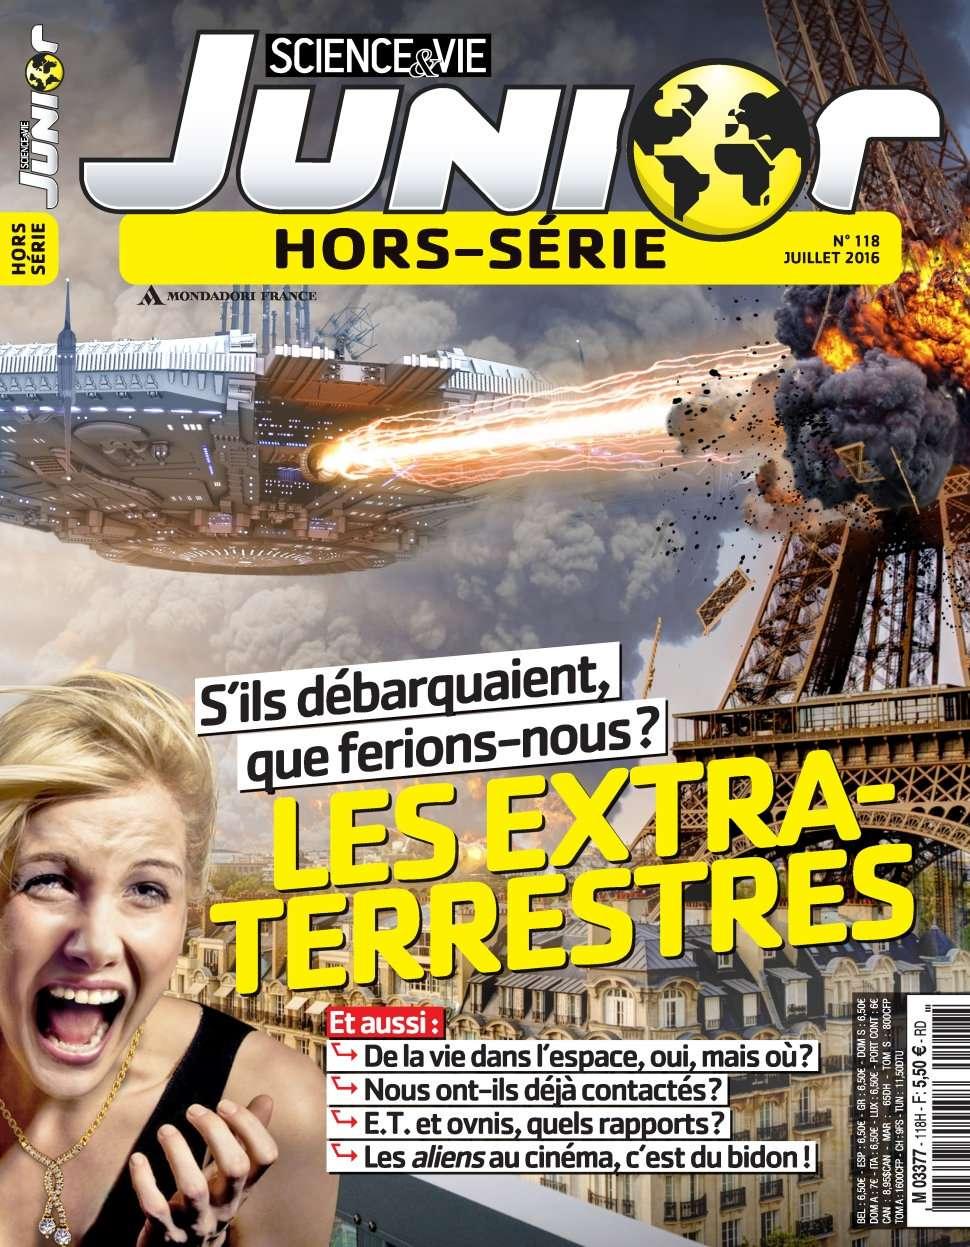 Science & Vie Junior Hors-Série 118 - Juillet 2016